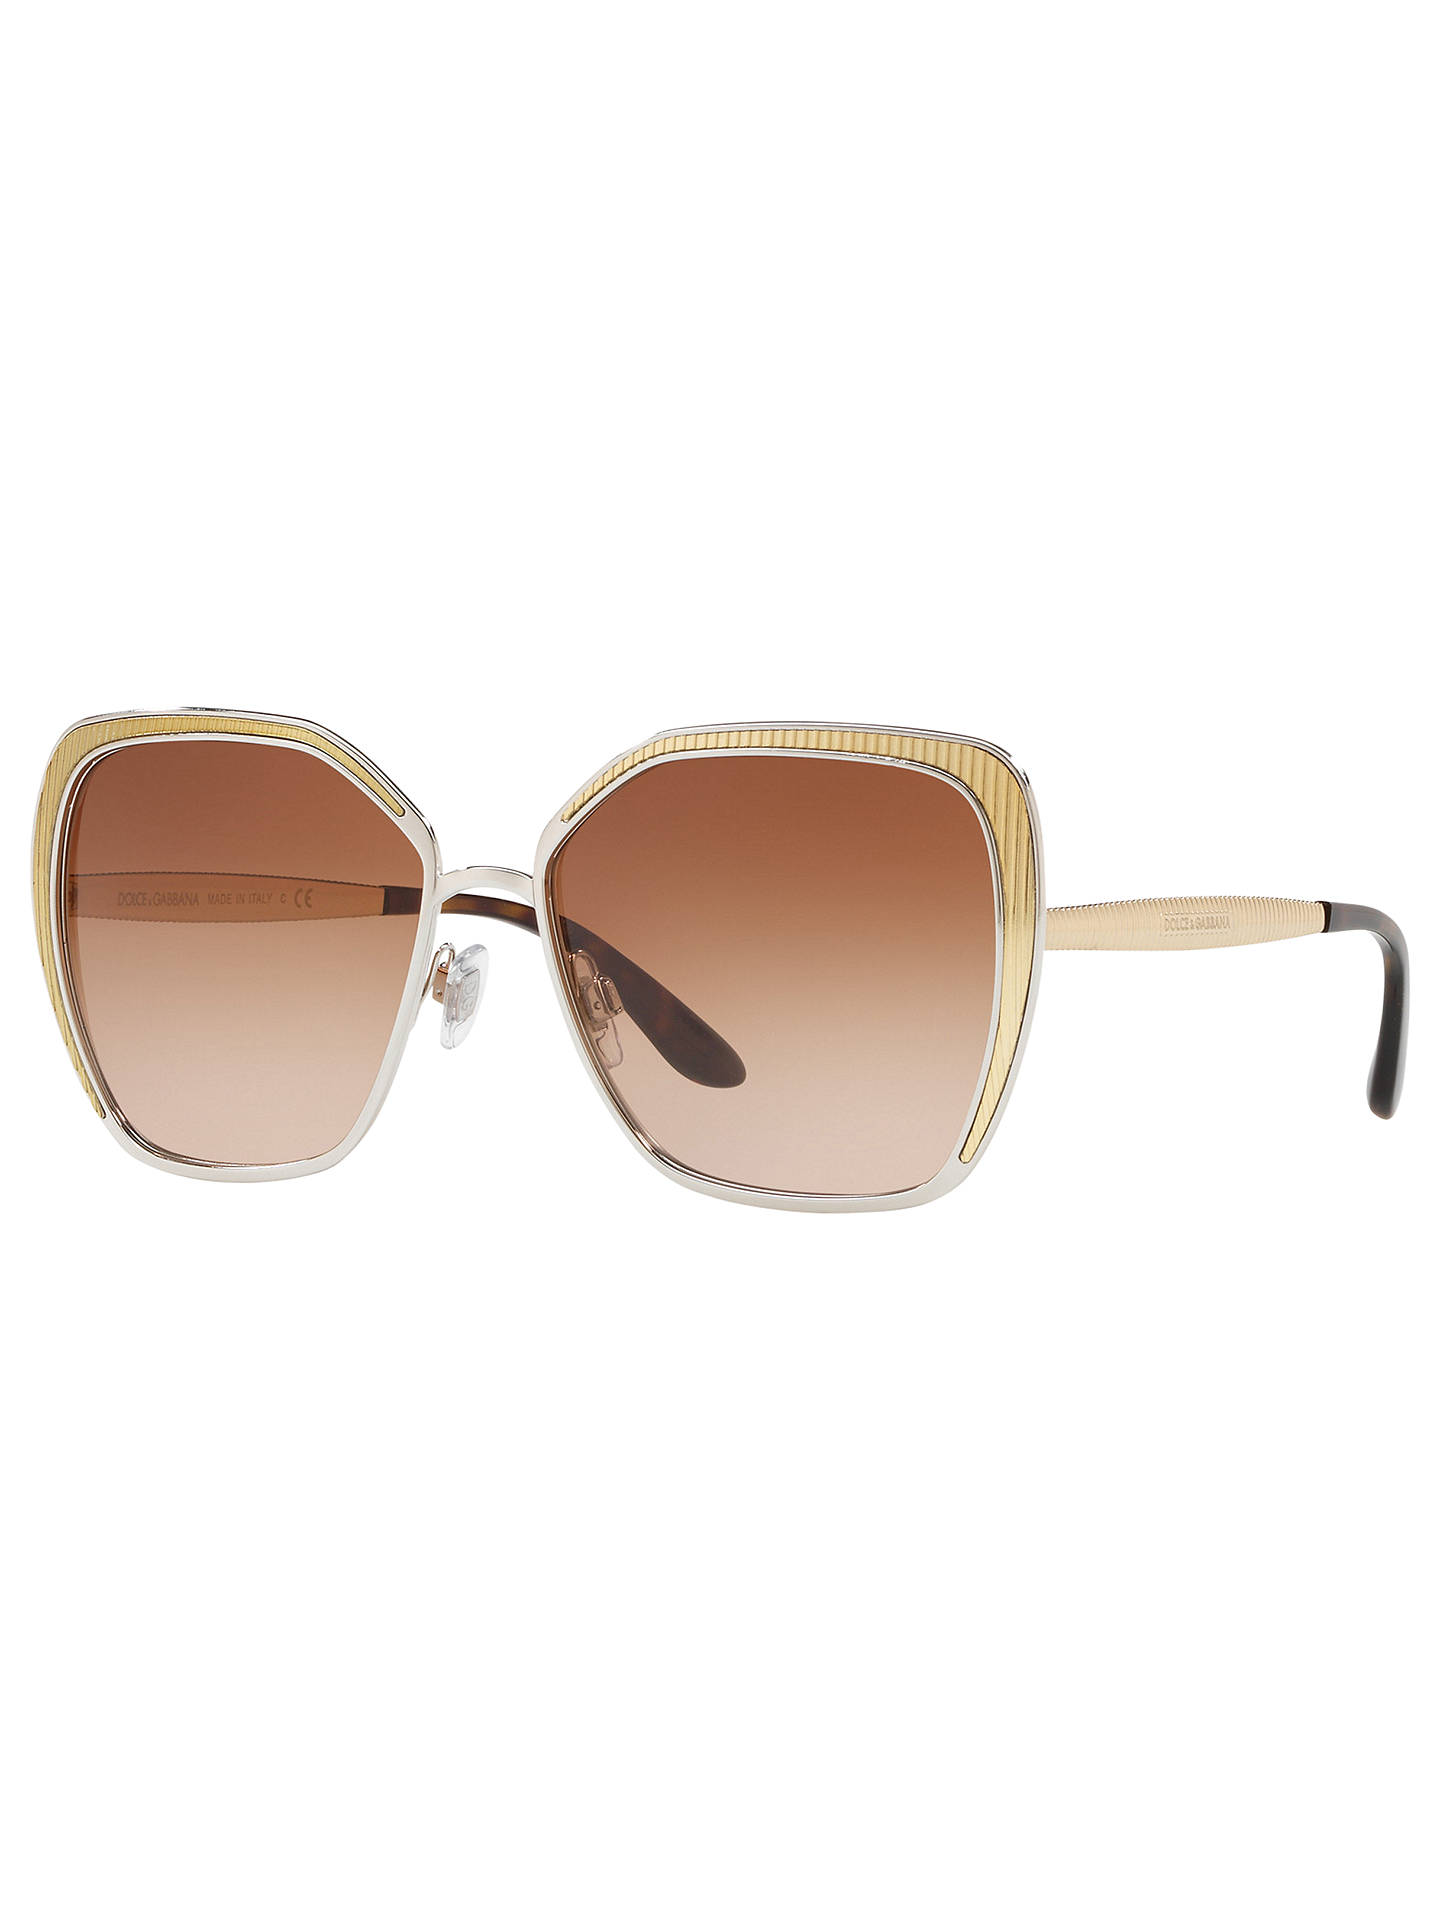 af38a2219e00 Dolce   Gabbana DG2197 Women s Geometric Sunglasses at John Lewis ...